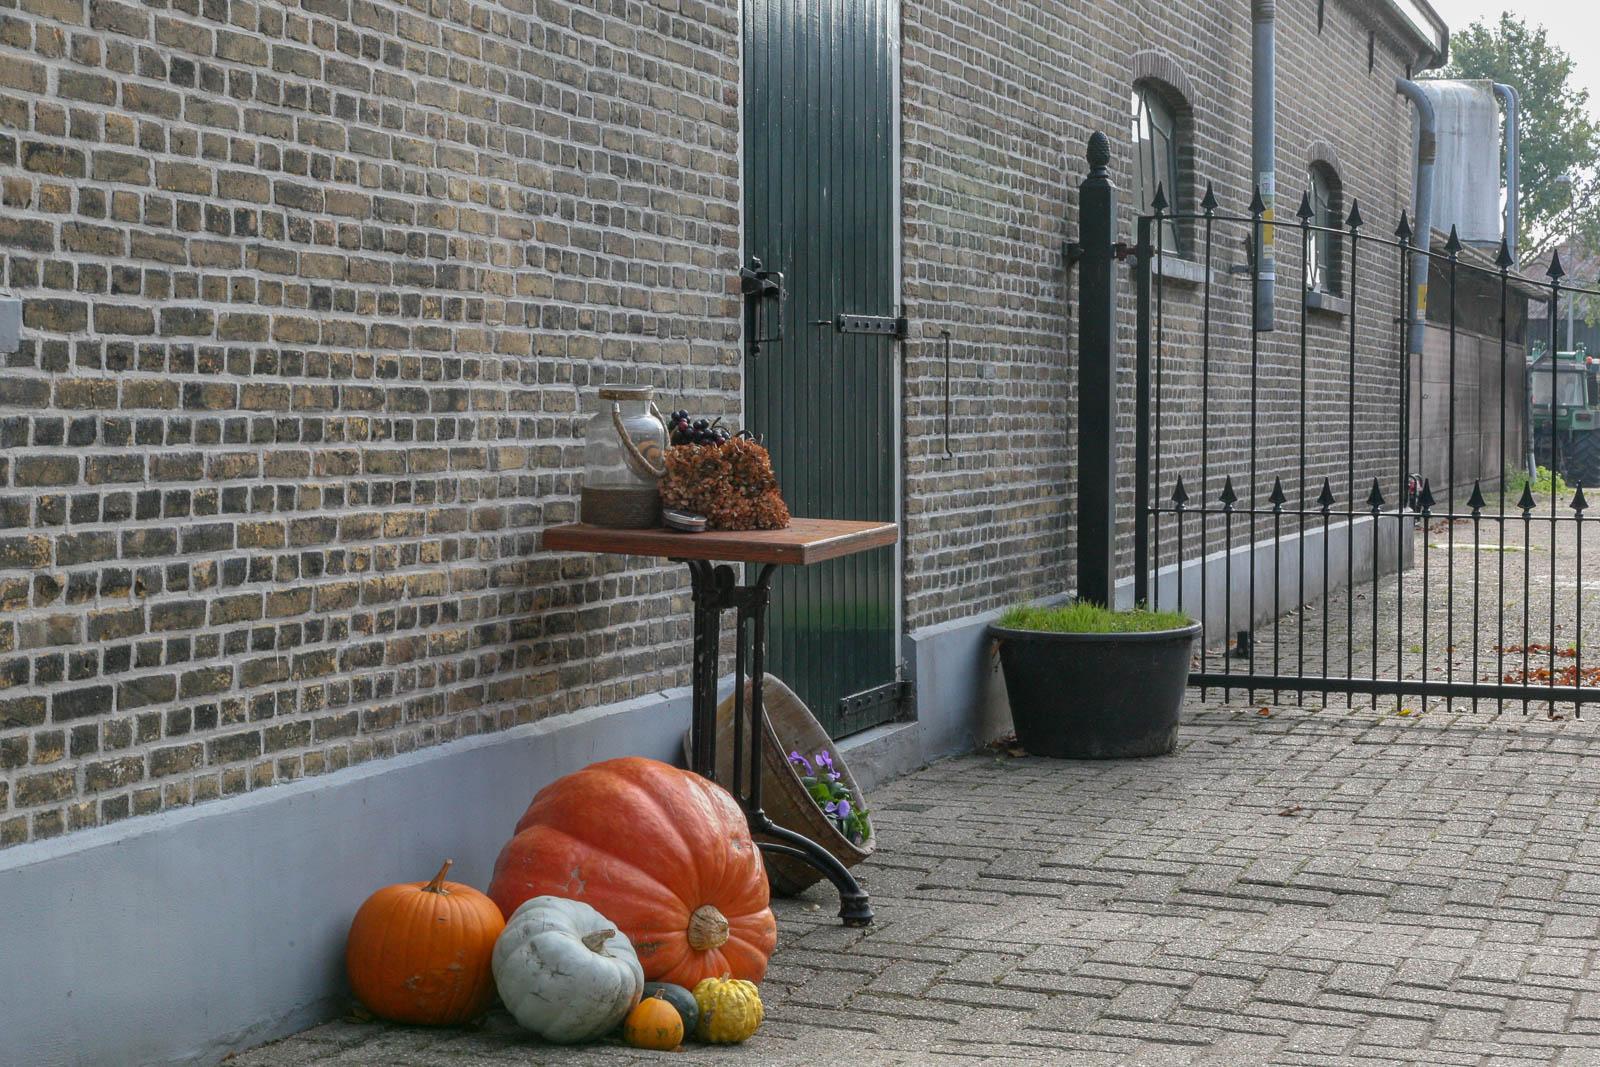 Hillegondahoeve-De Oude Stal-1477